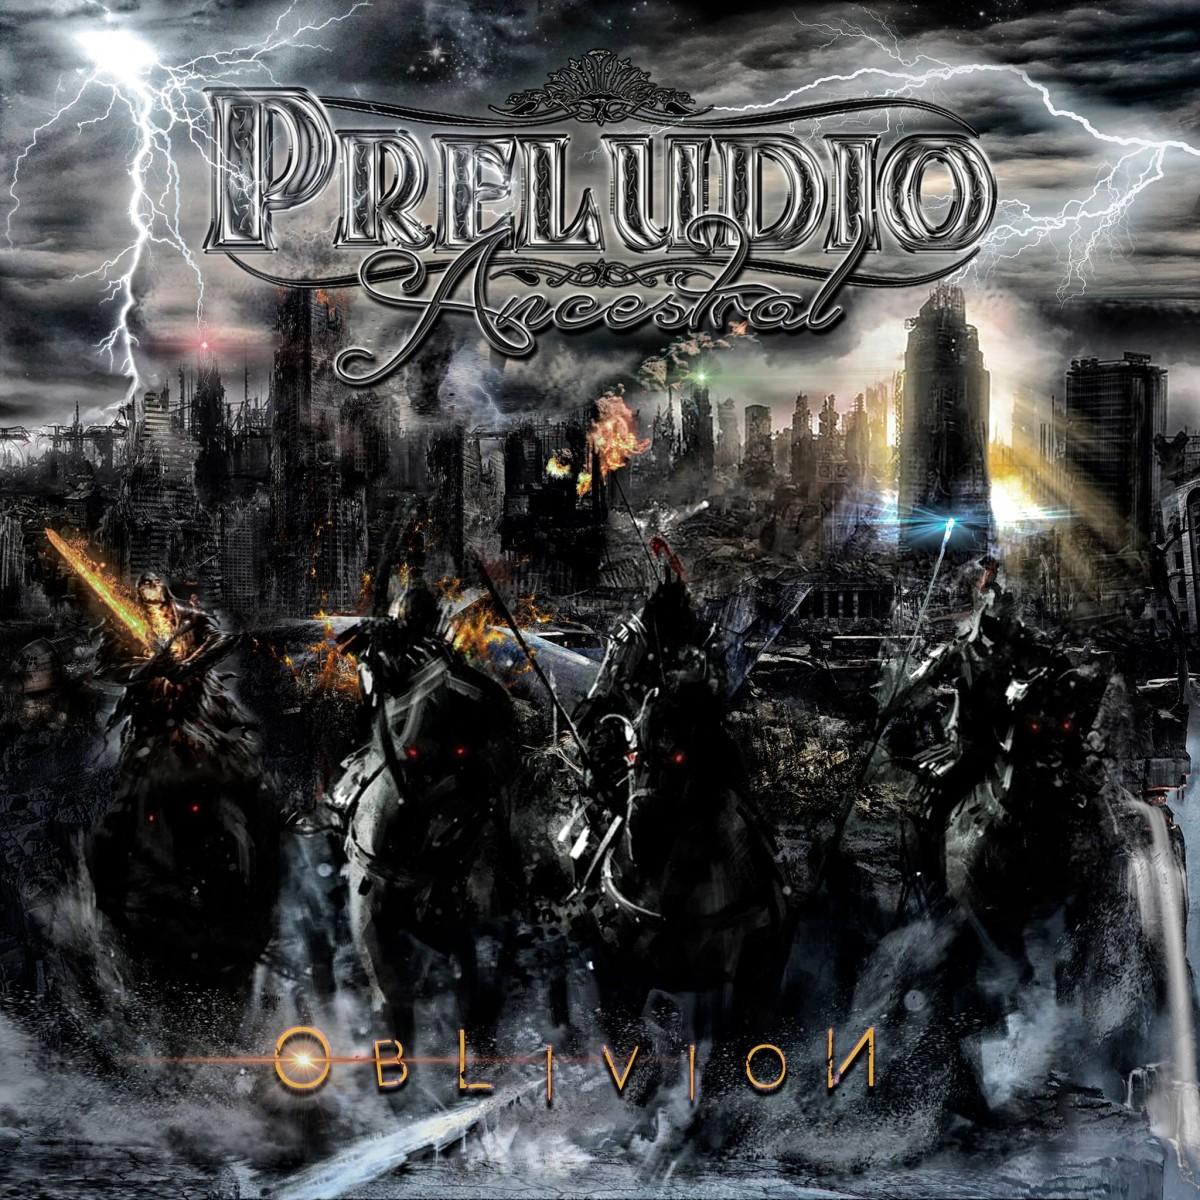 118615-Preludio-Ancestral-Oblivion